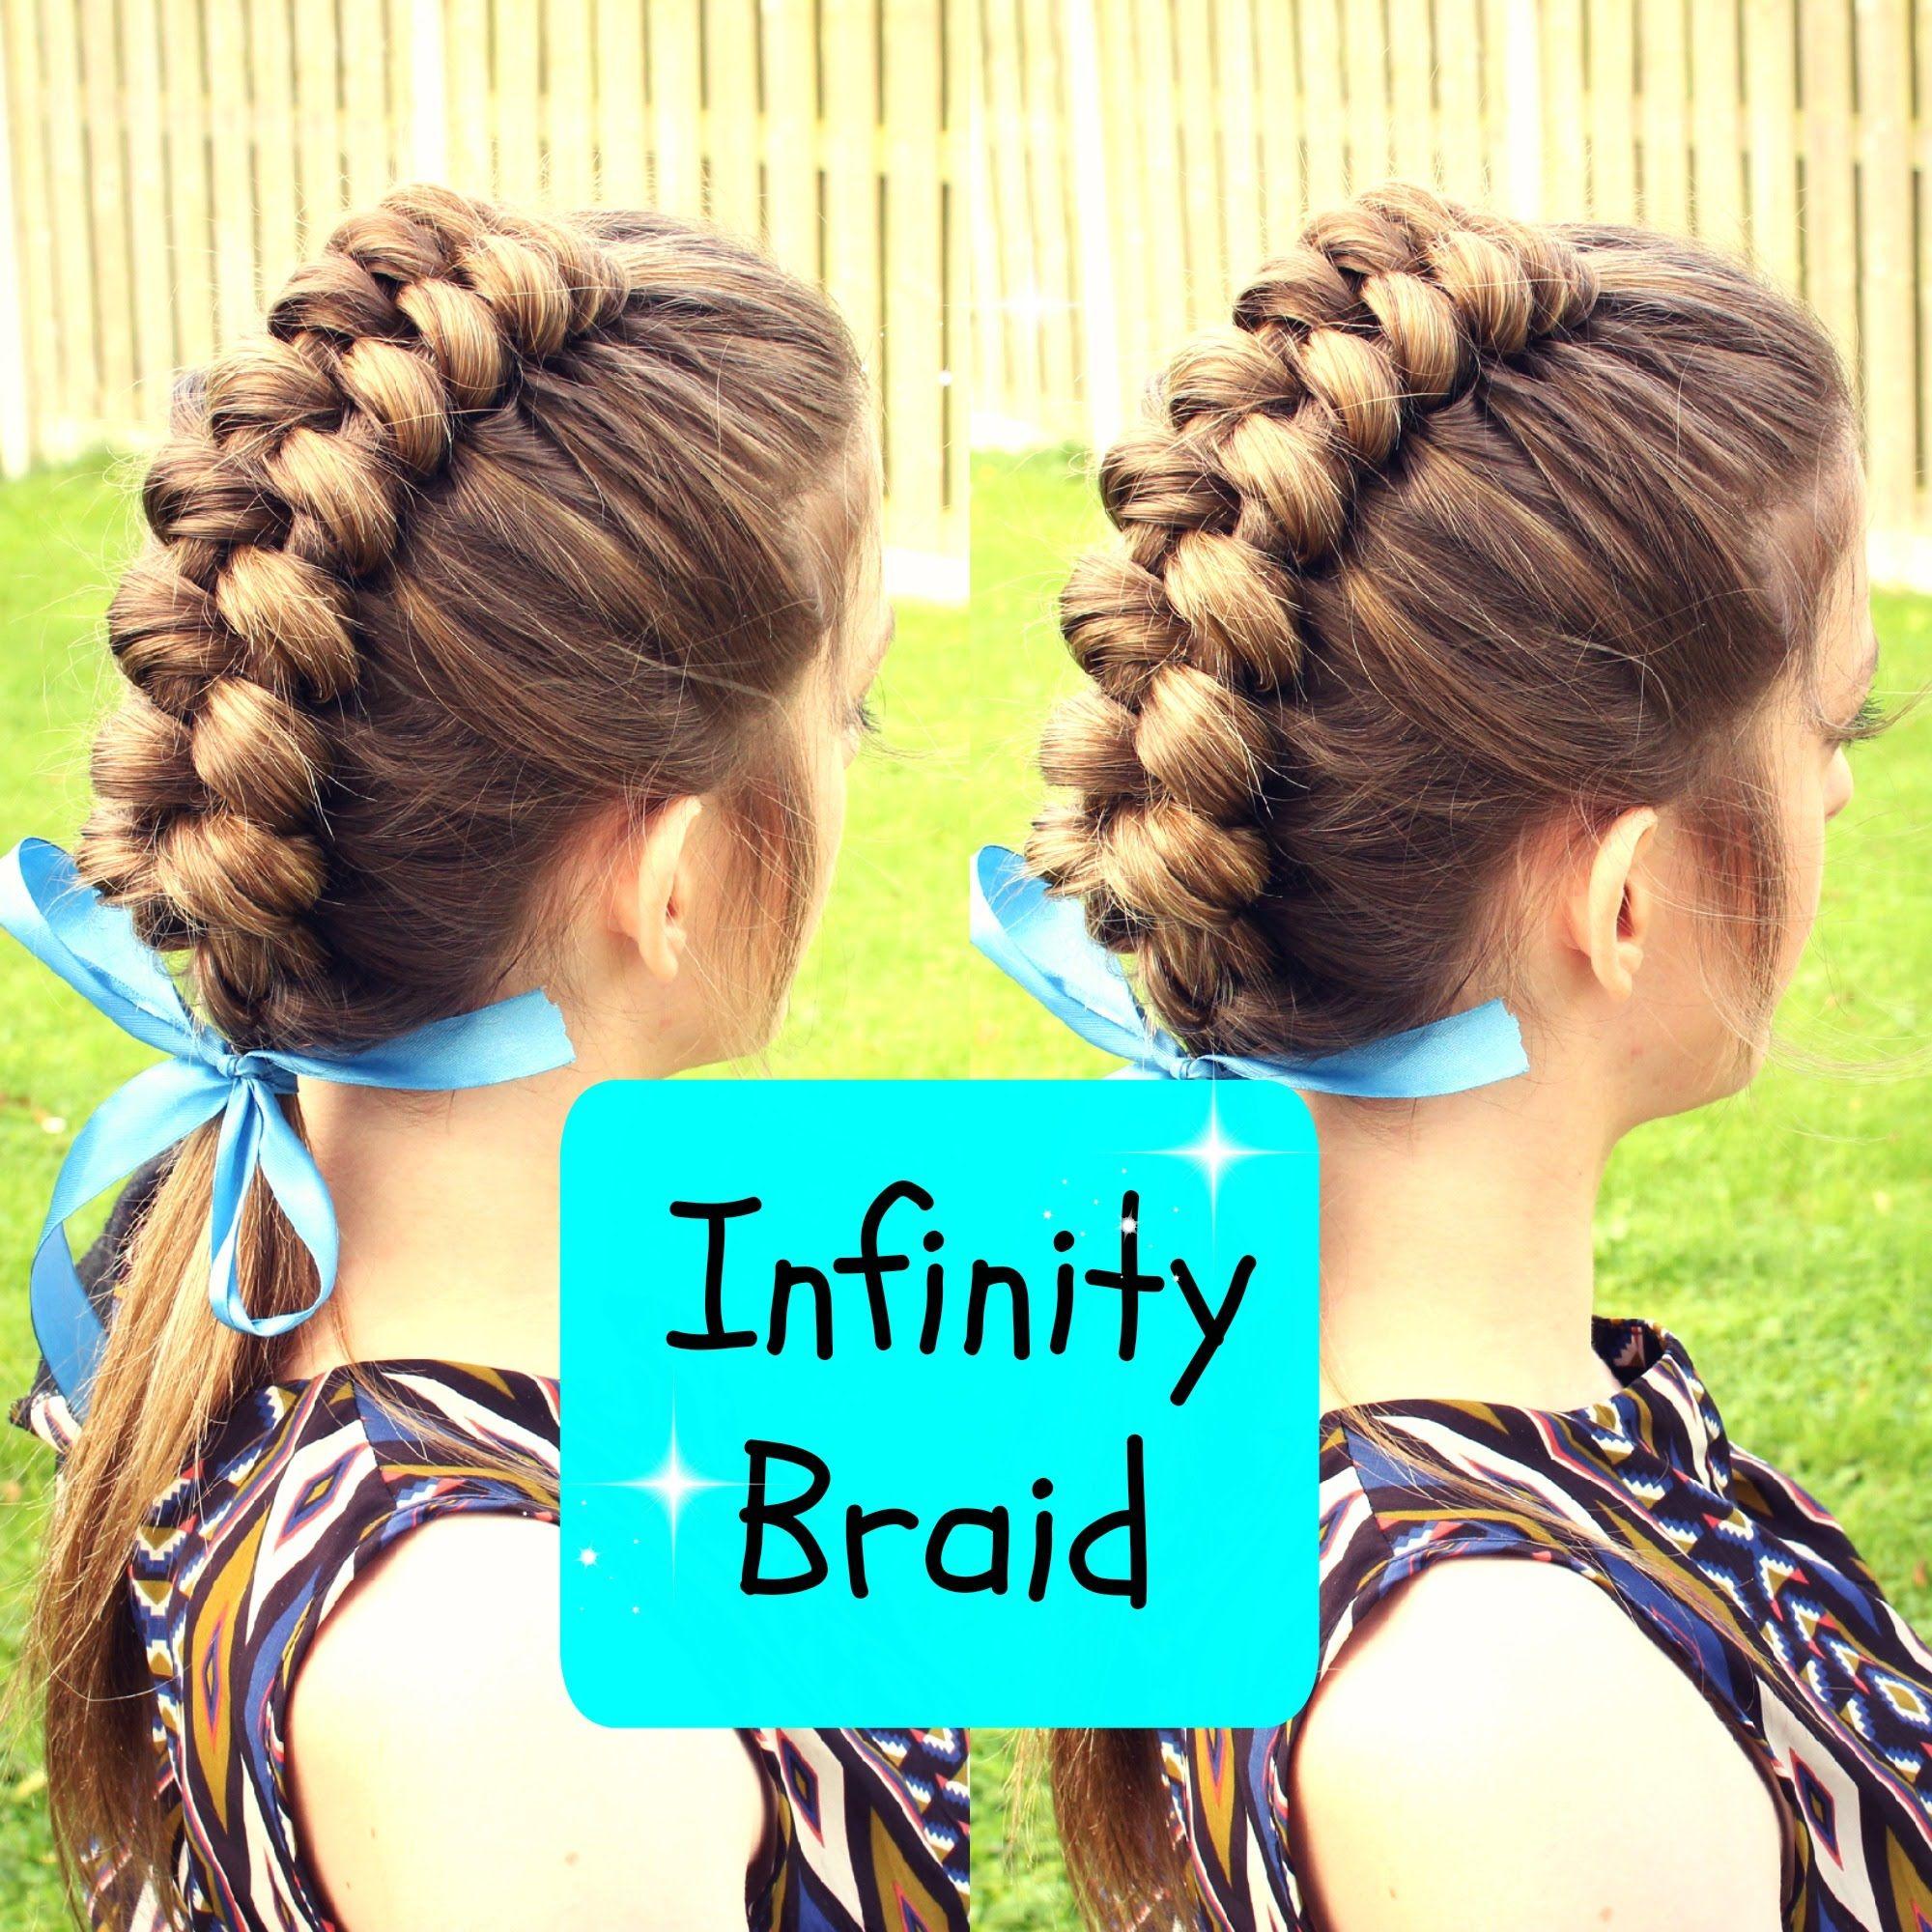 Dutch infinity braid dutch braid how to my channel for more